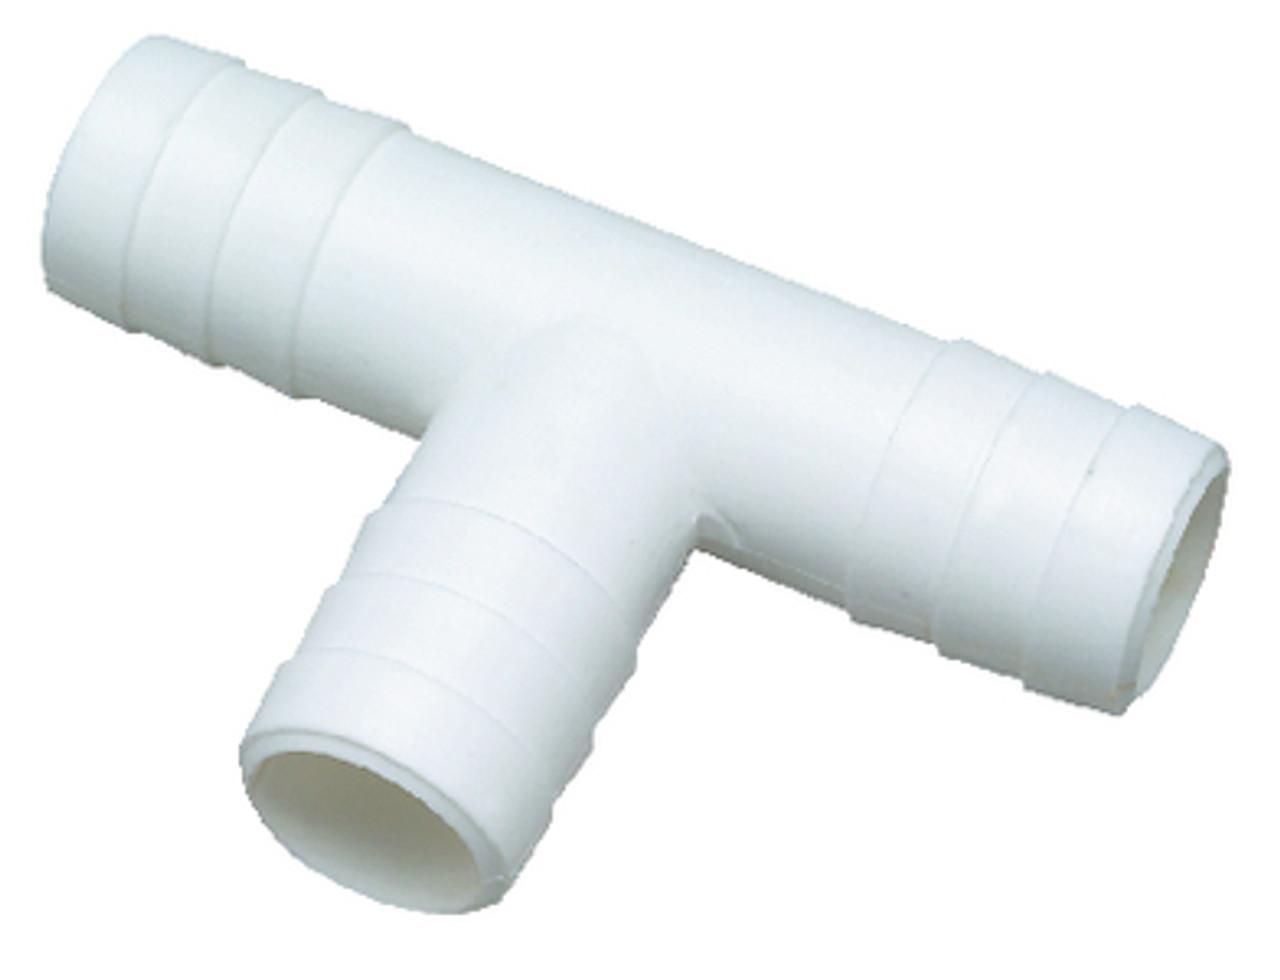 1-1//8 Inch Extra Long Plastic Thru-Hull Bilge Pump Hose Fitting for Boats